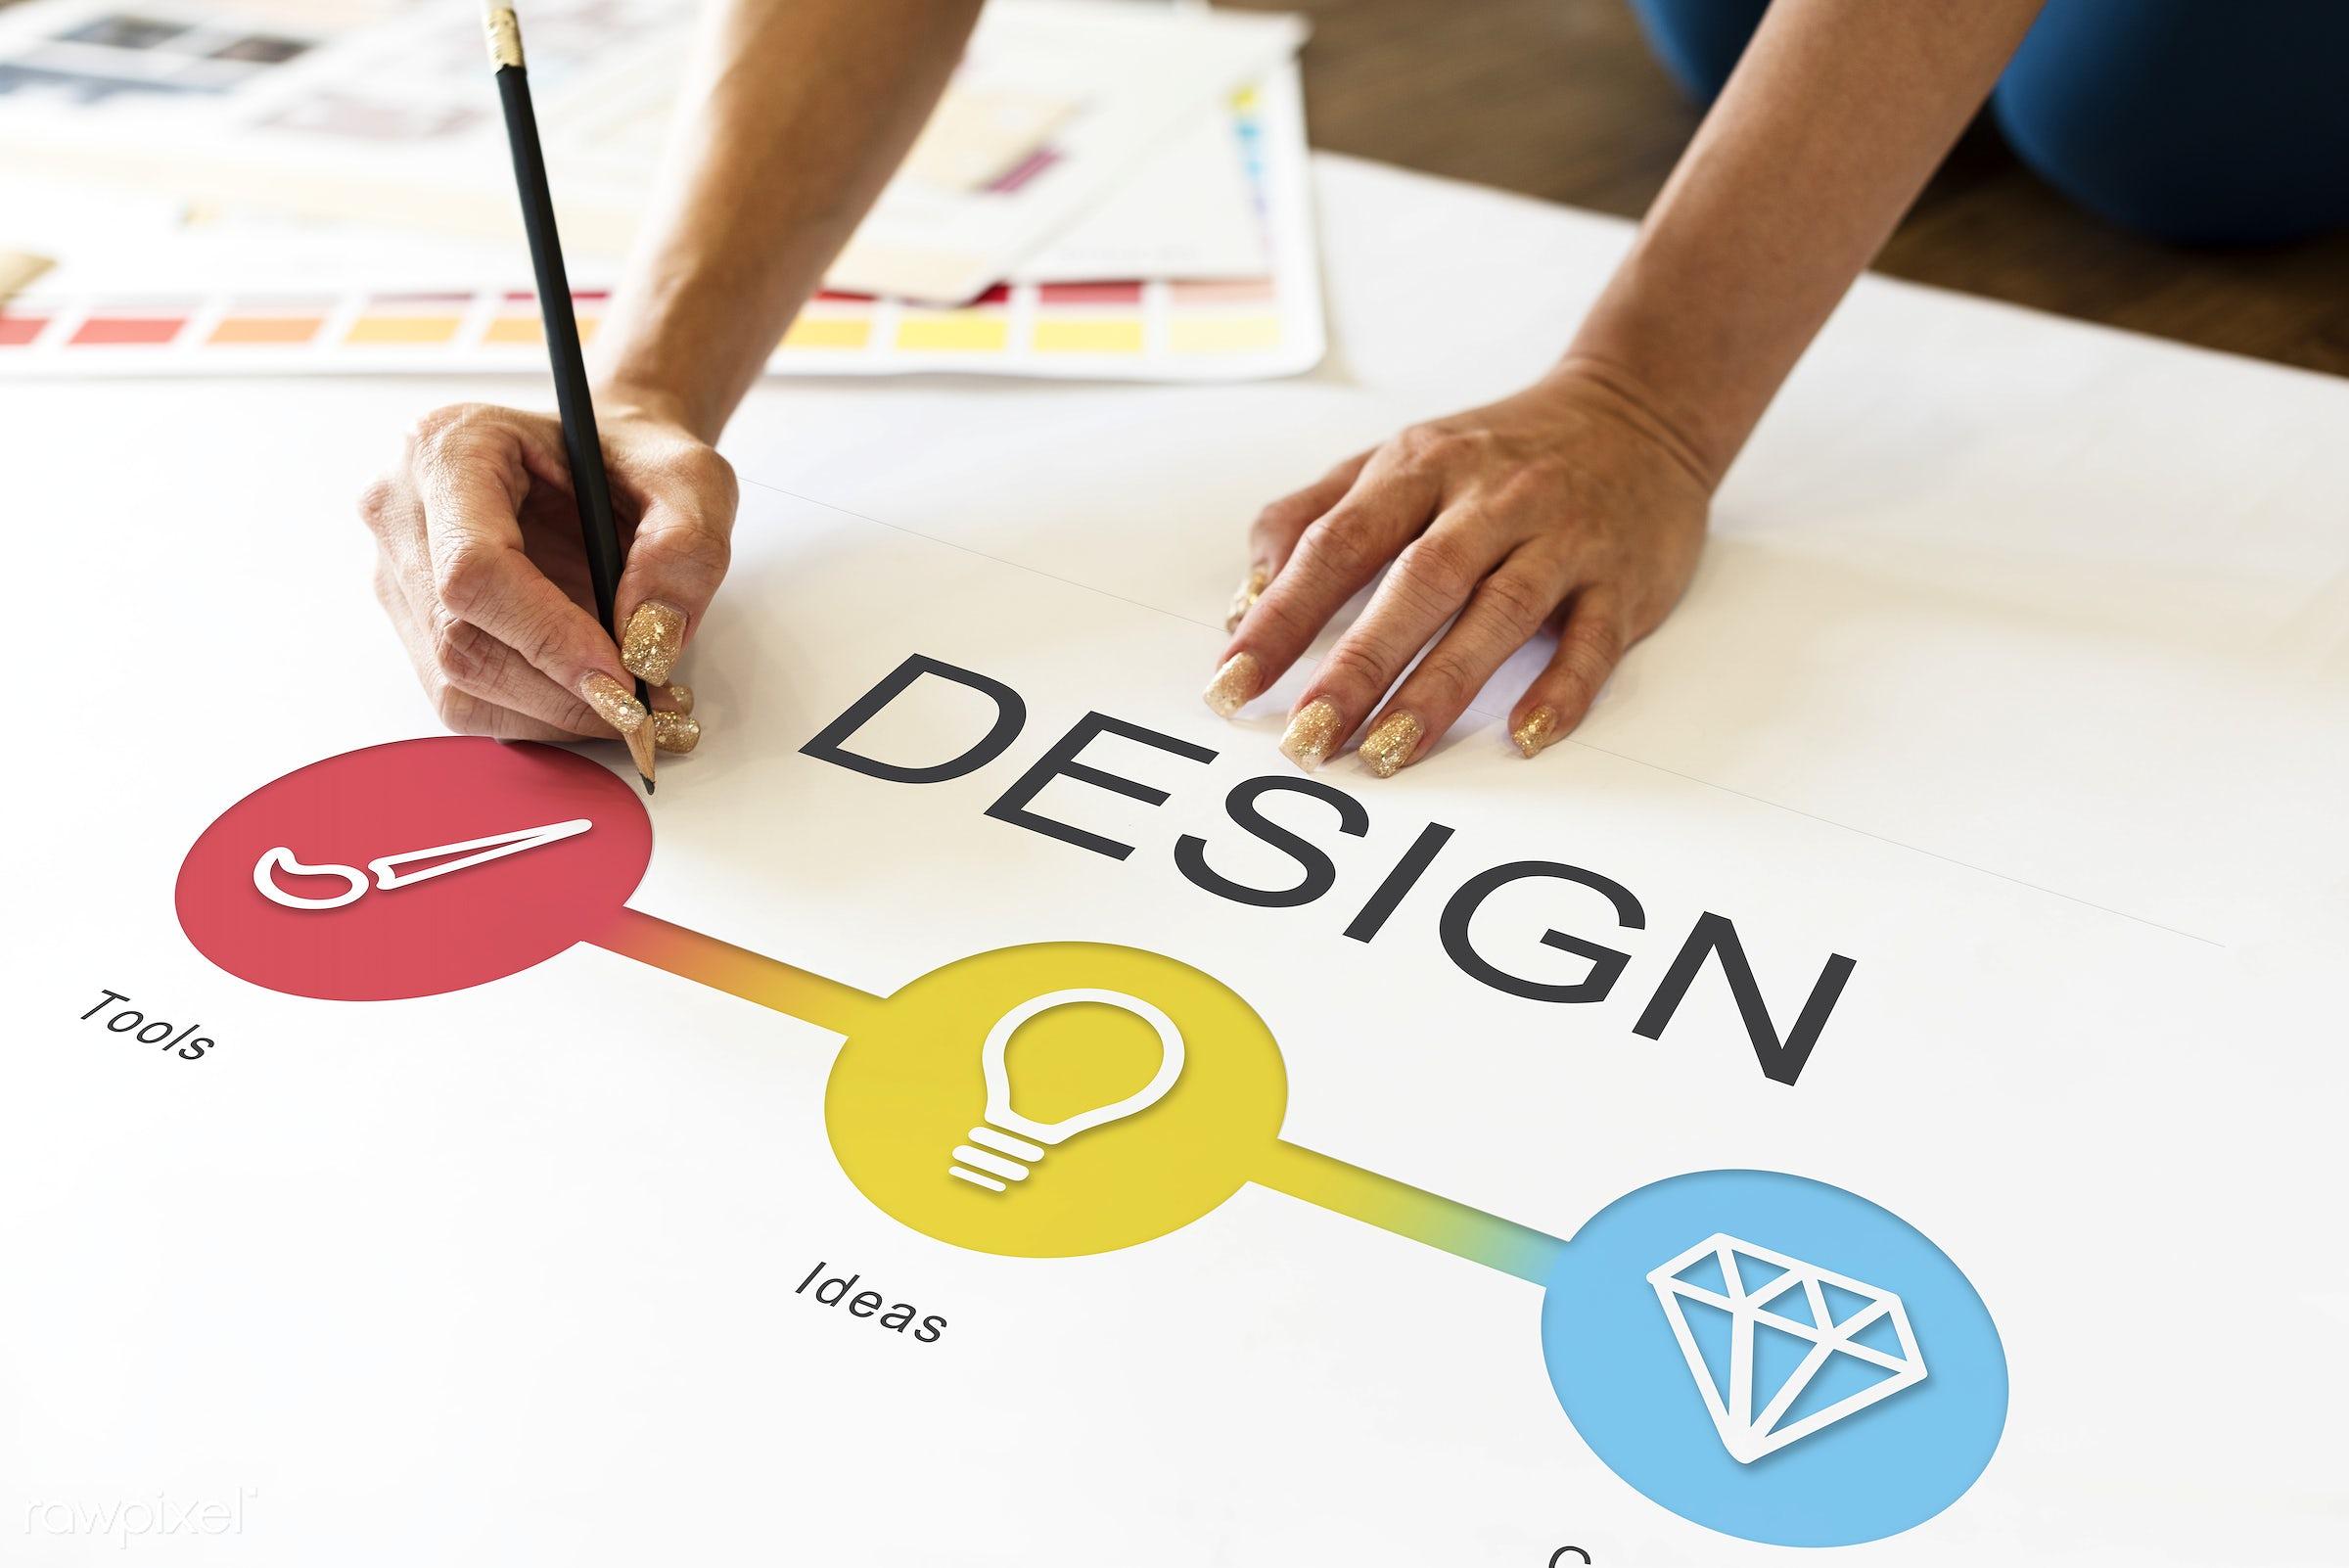 art, business, cloud, concept, creation, creative, creativity, design, digital, drawing, hands, icon, ideas, illustration,...